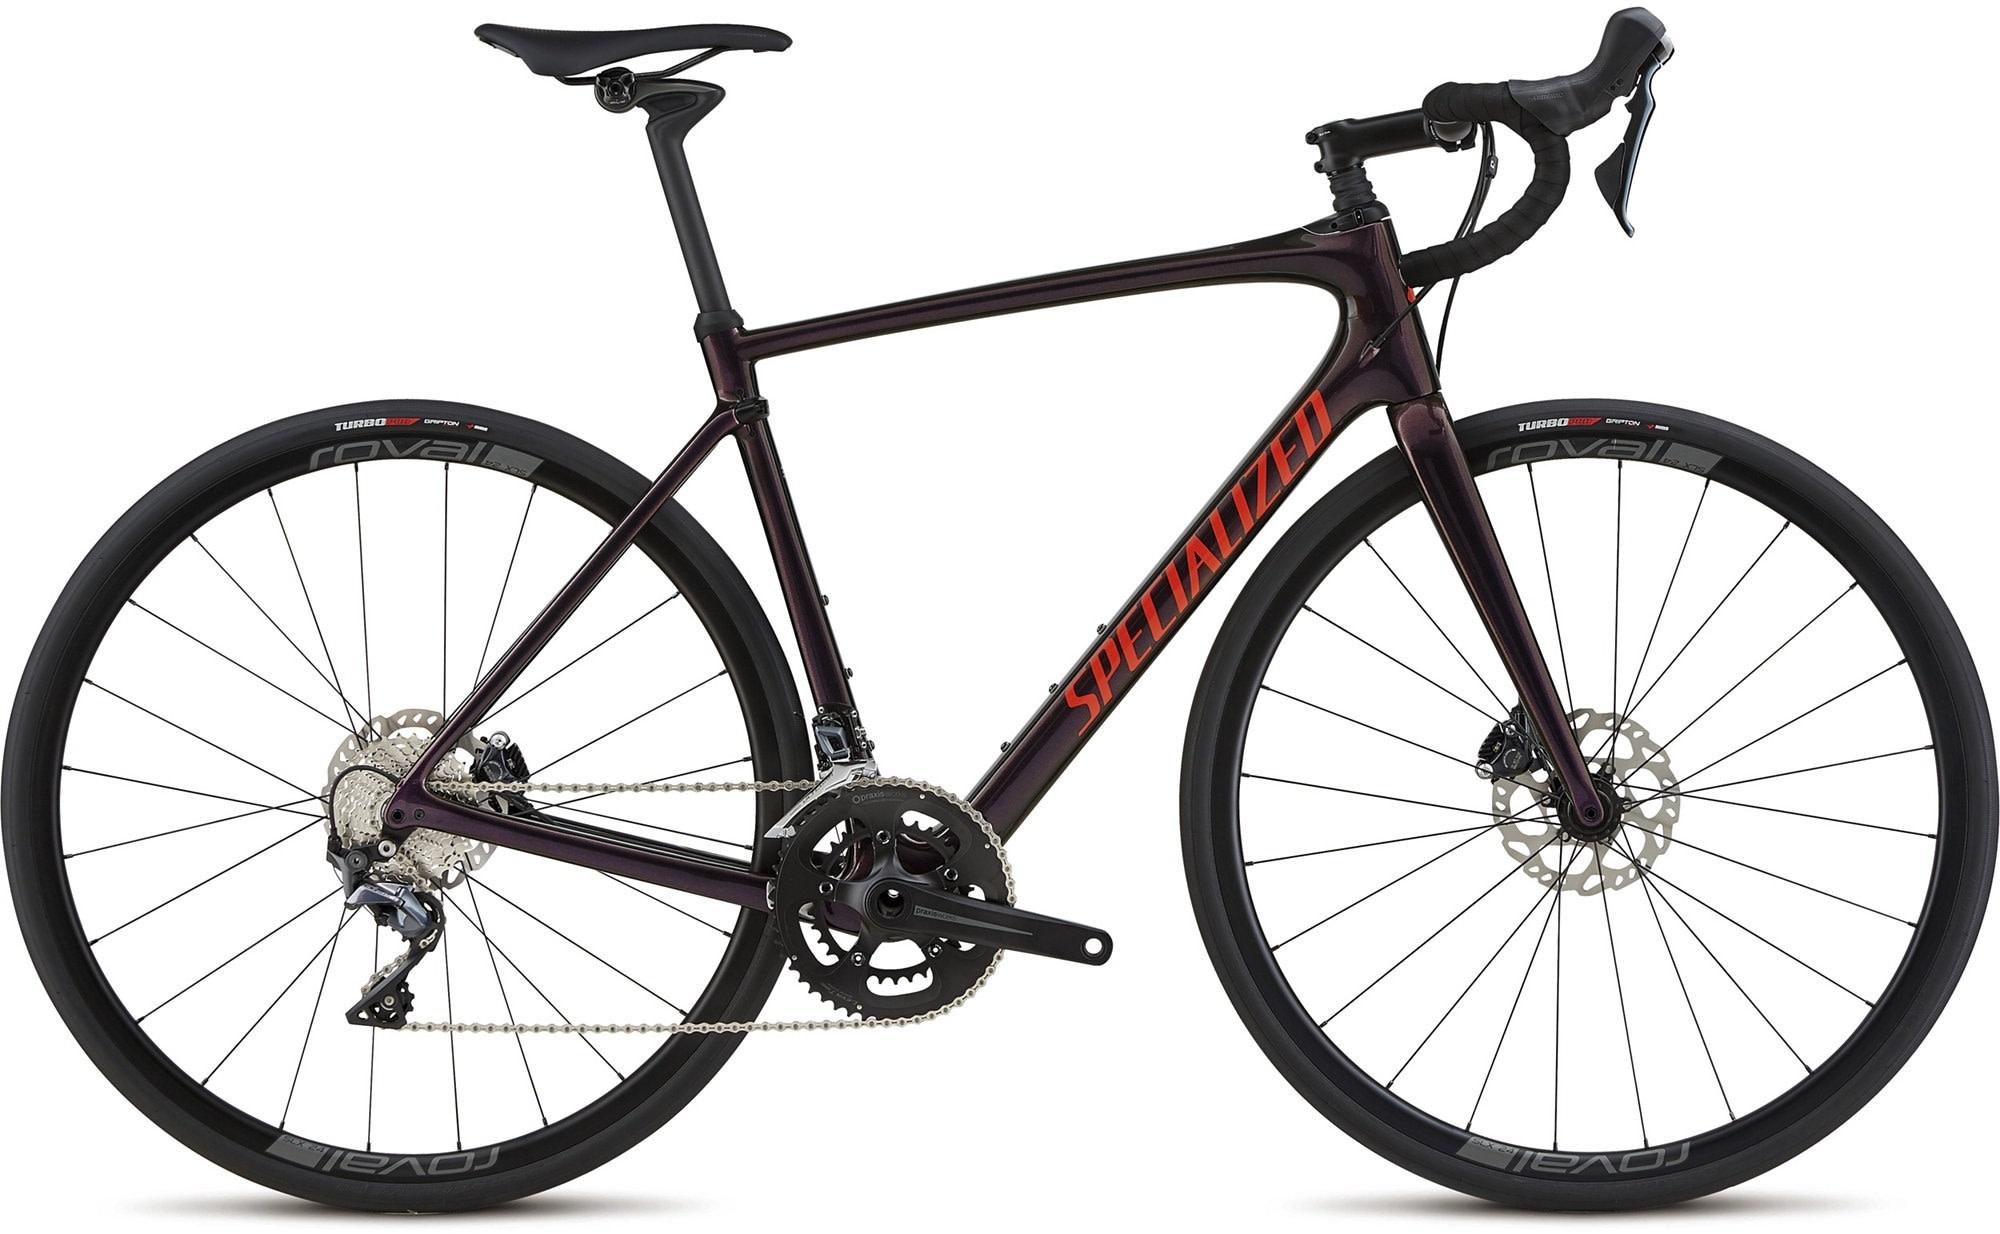 2018 Roubaix Comp ***64cm ONLY!***